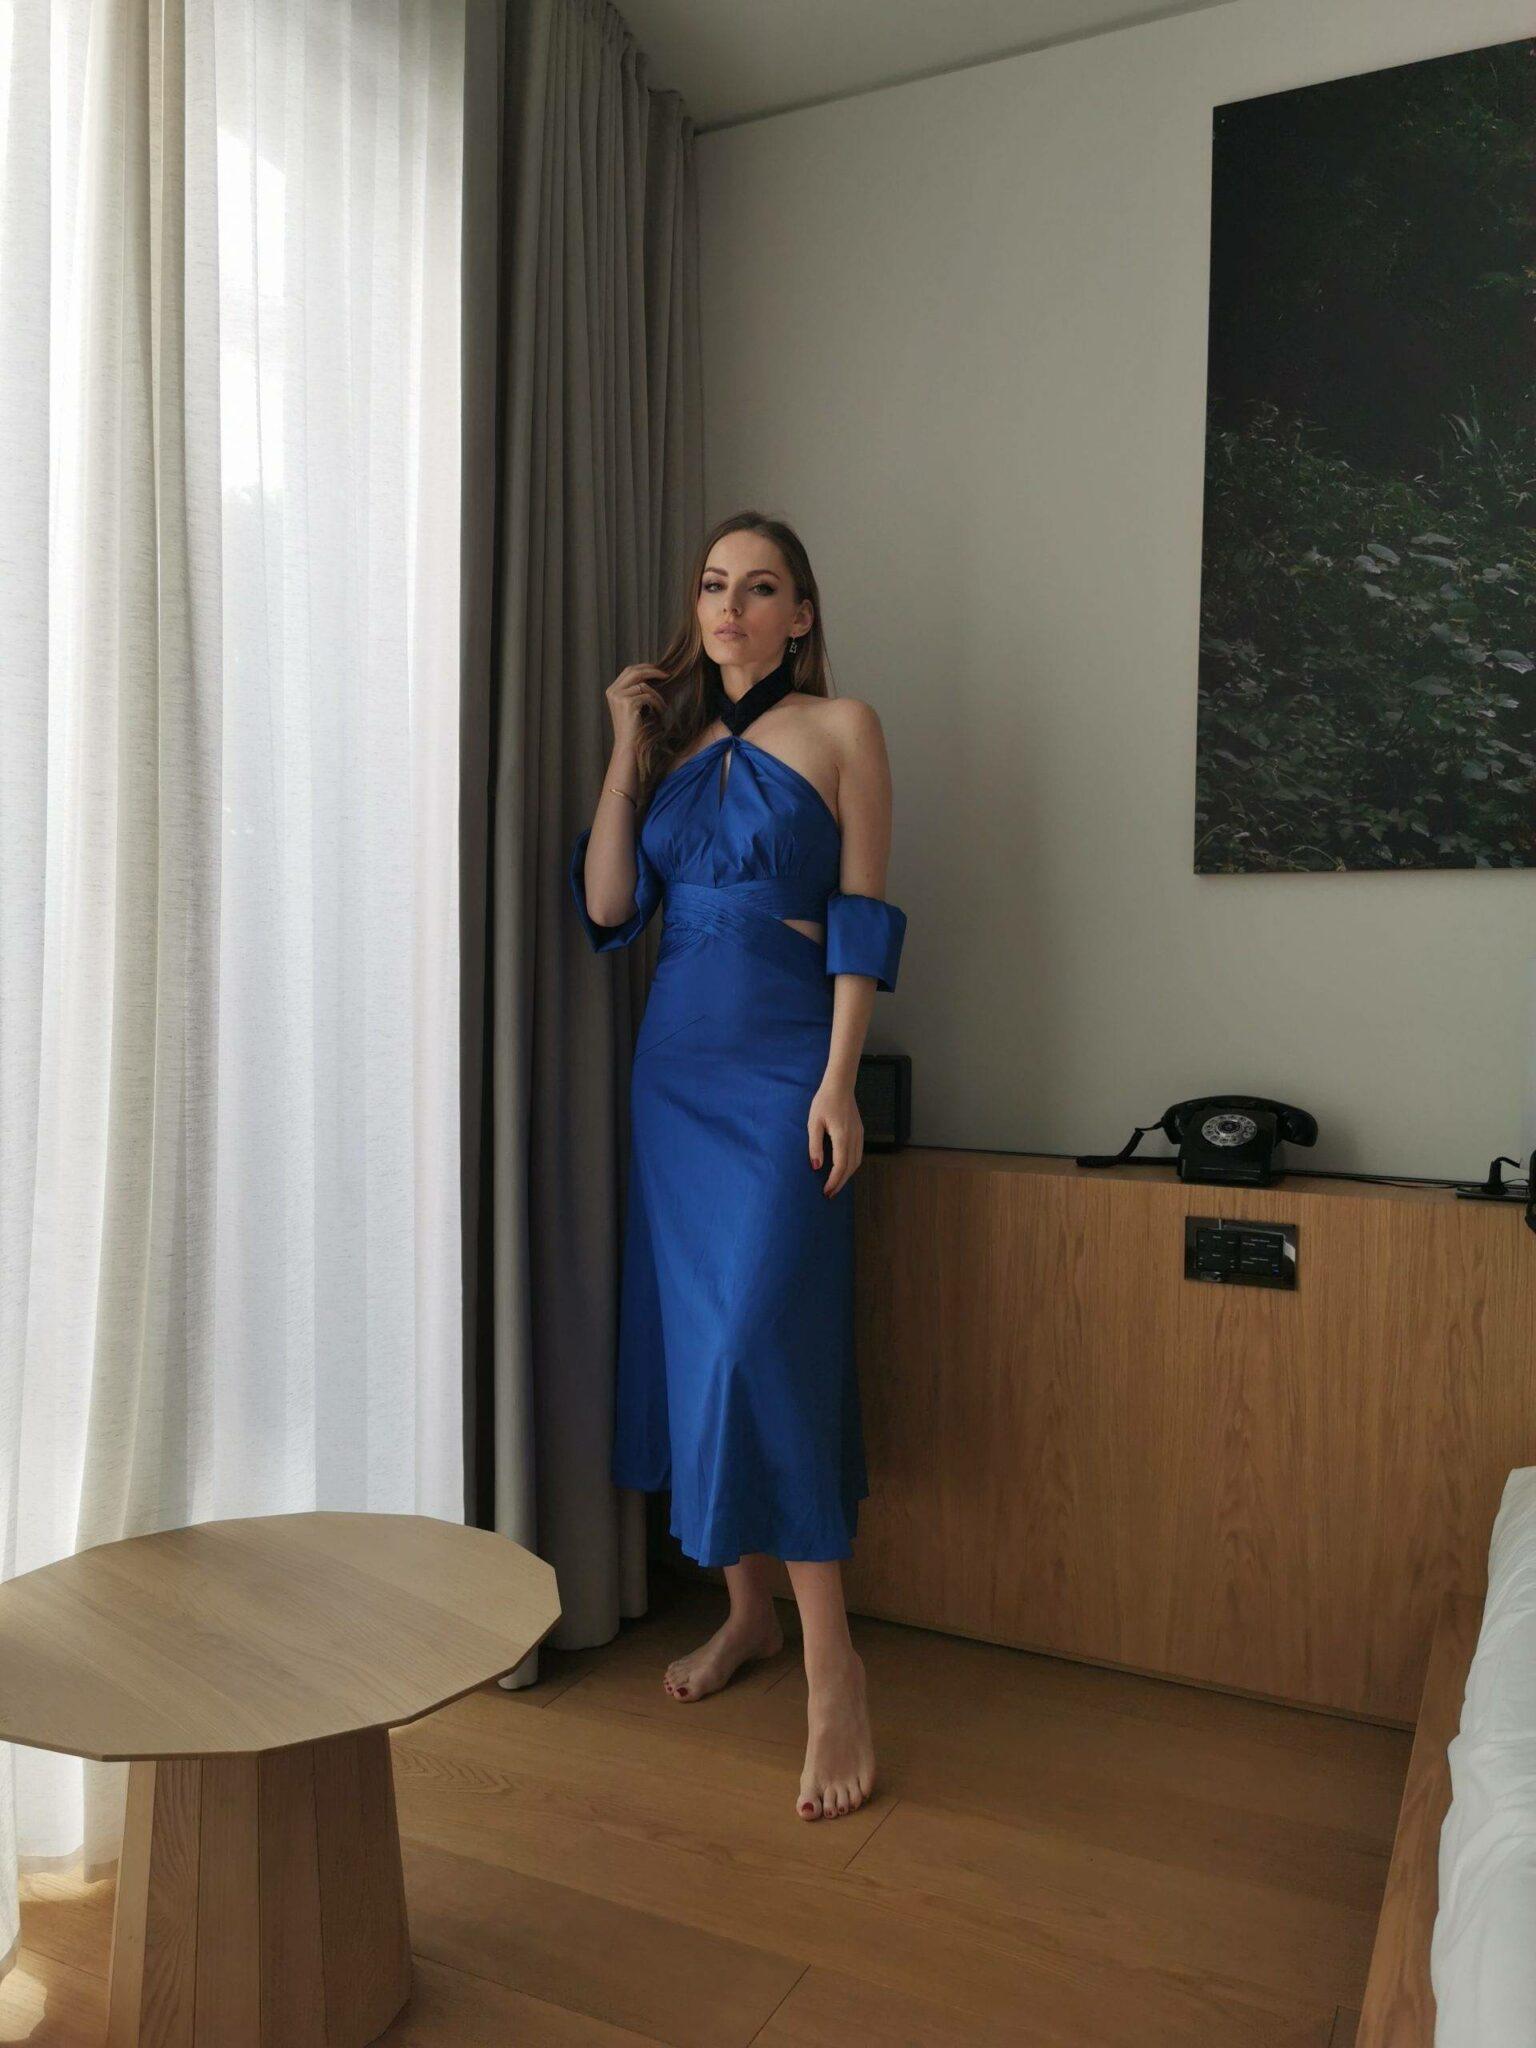 Bella Zofia wearing Three Floor Her majesty dress  Maxi dress Spring Summer 2021 trend